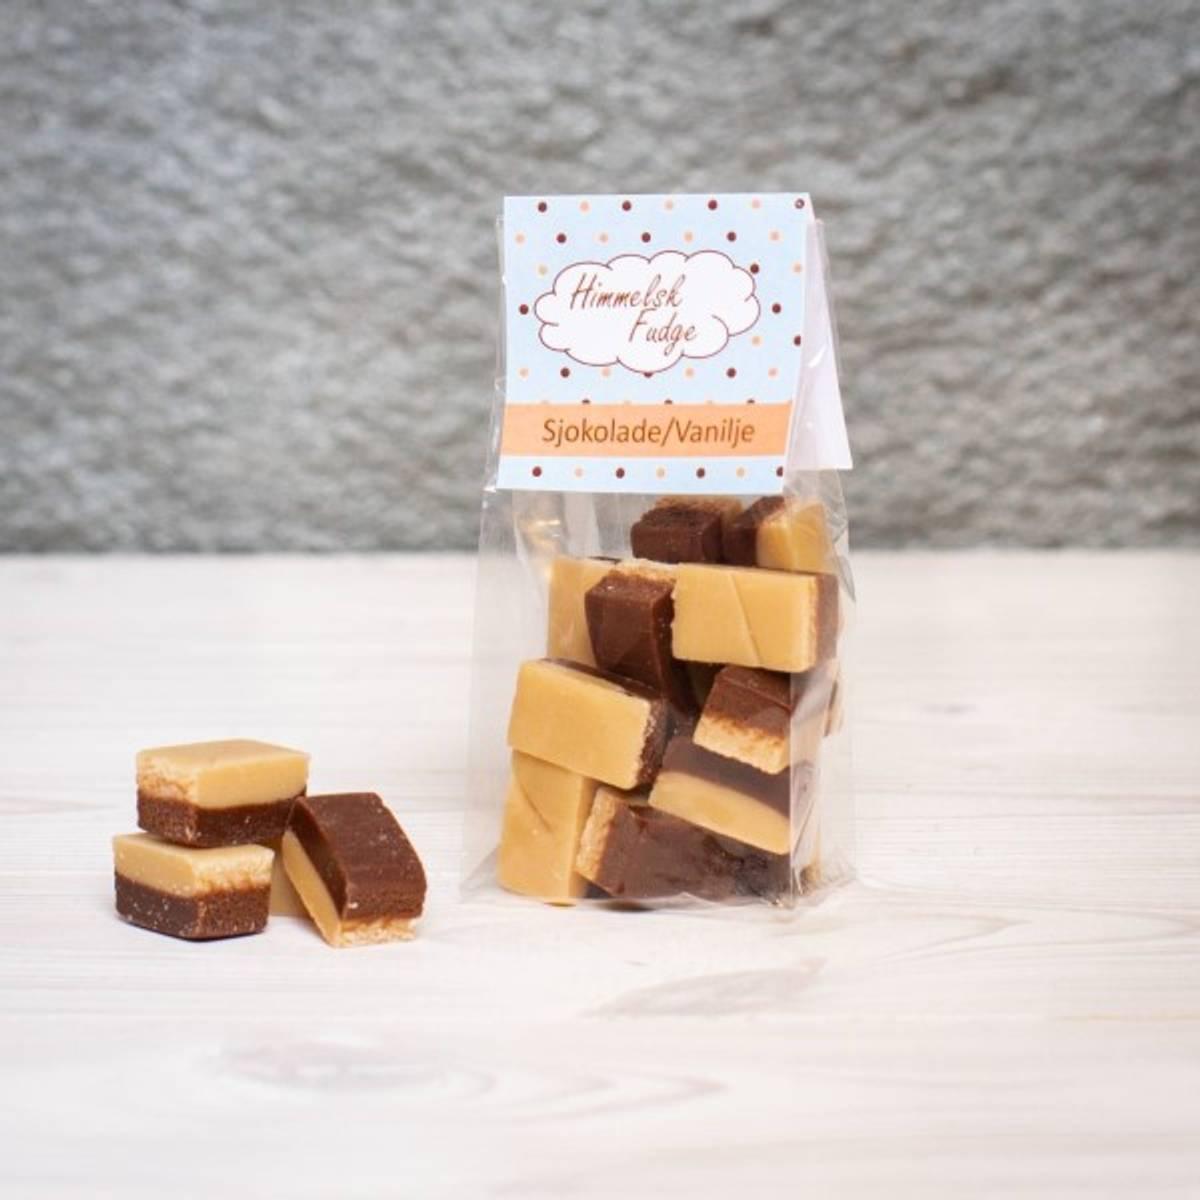 Sjokolade/Vanilje Fudge 100g BF: 31.07.2021 Datovare